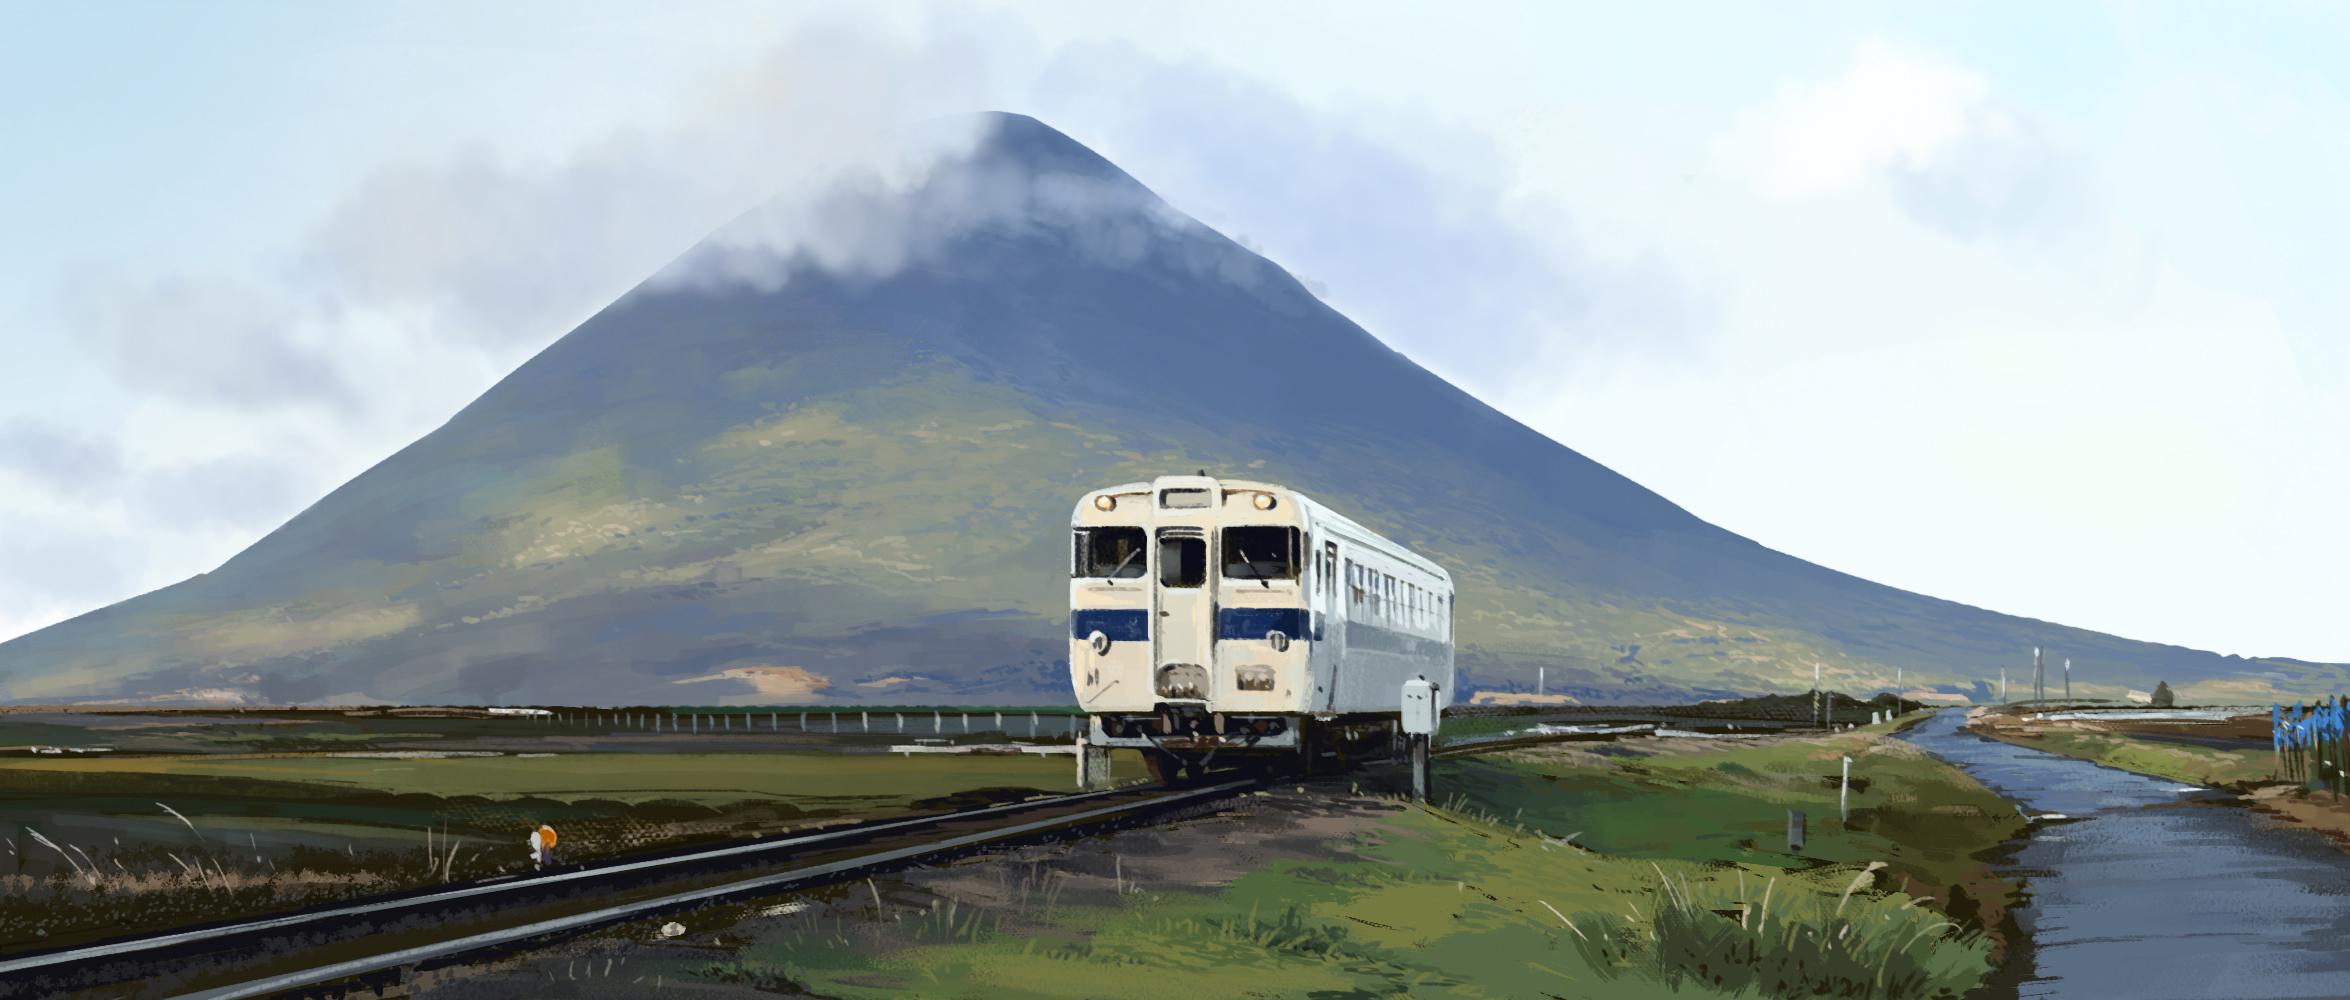 Kaimondake volcano - Kyushu by alantsuei